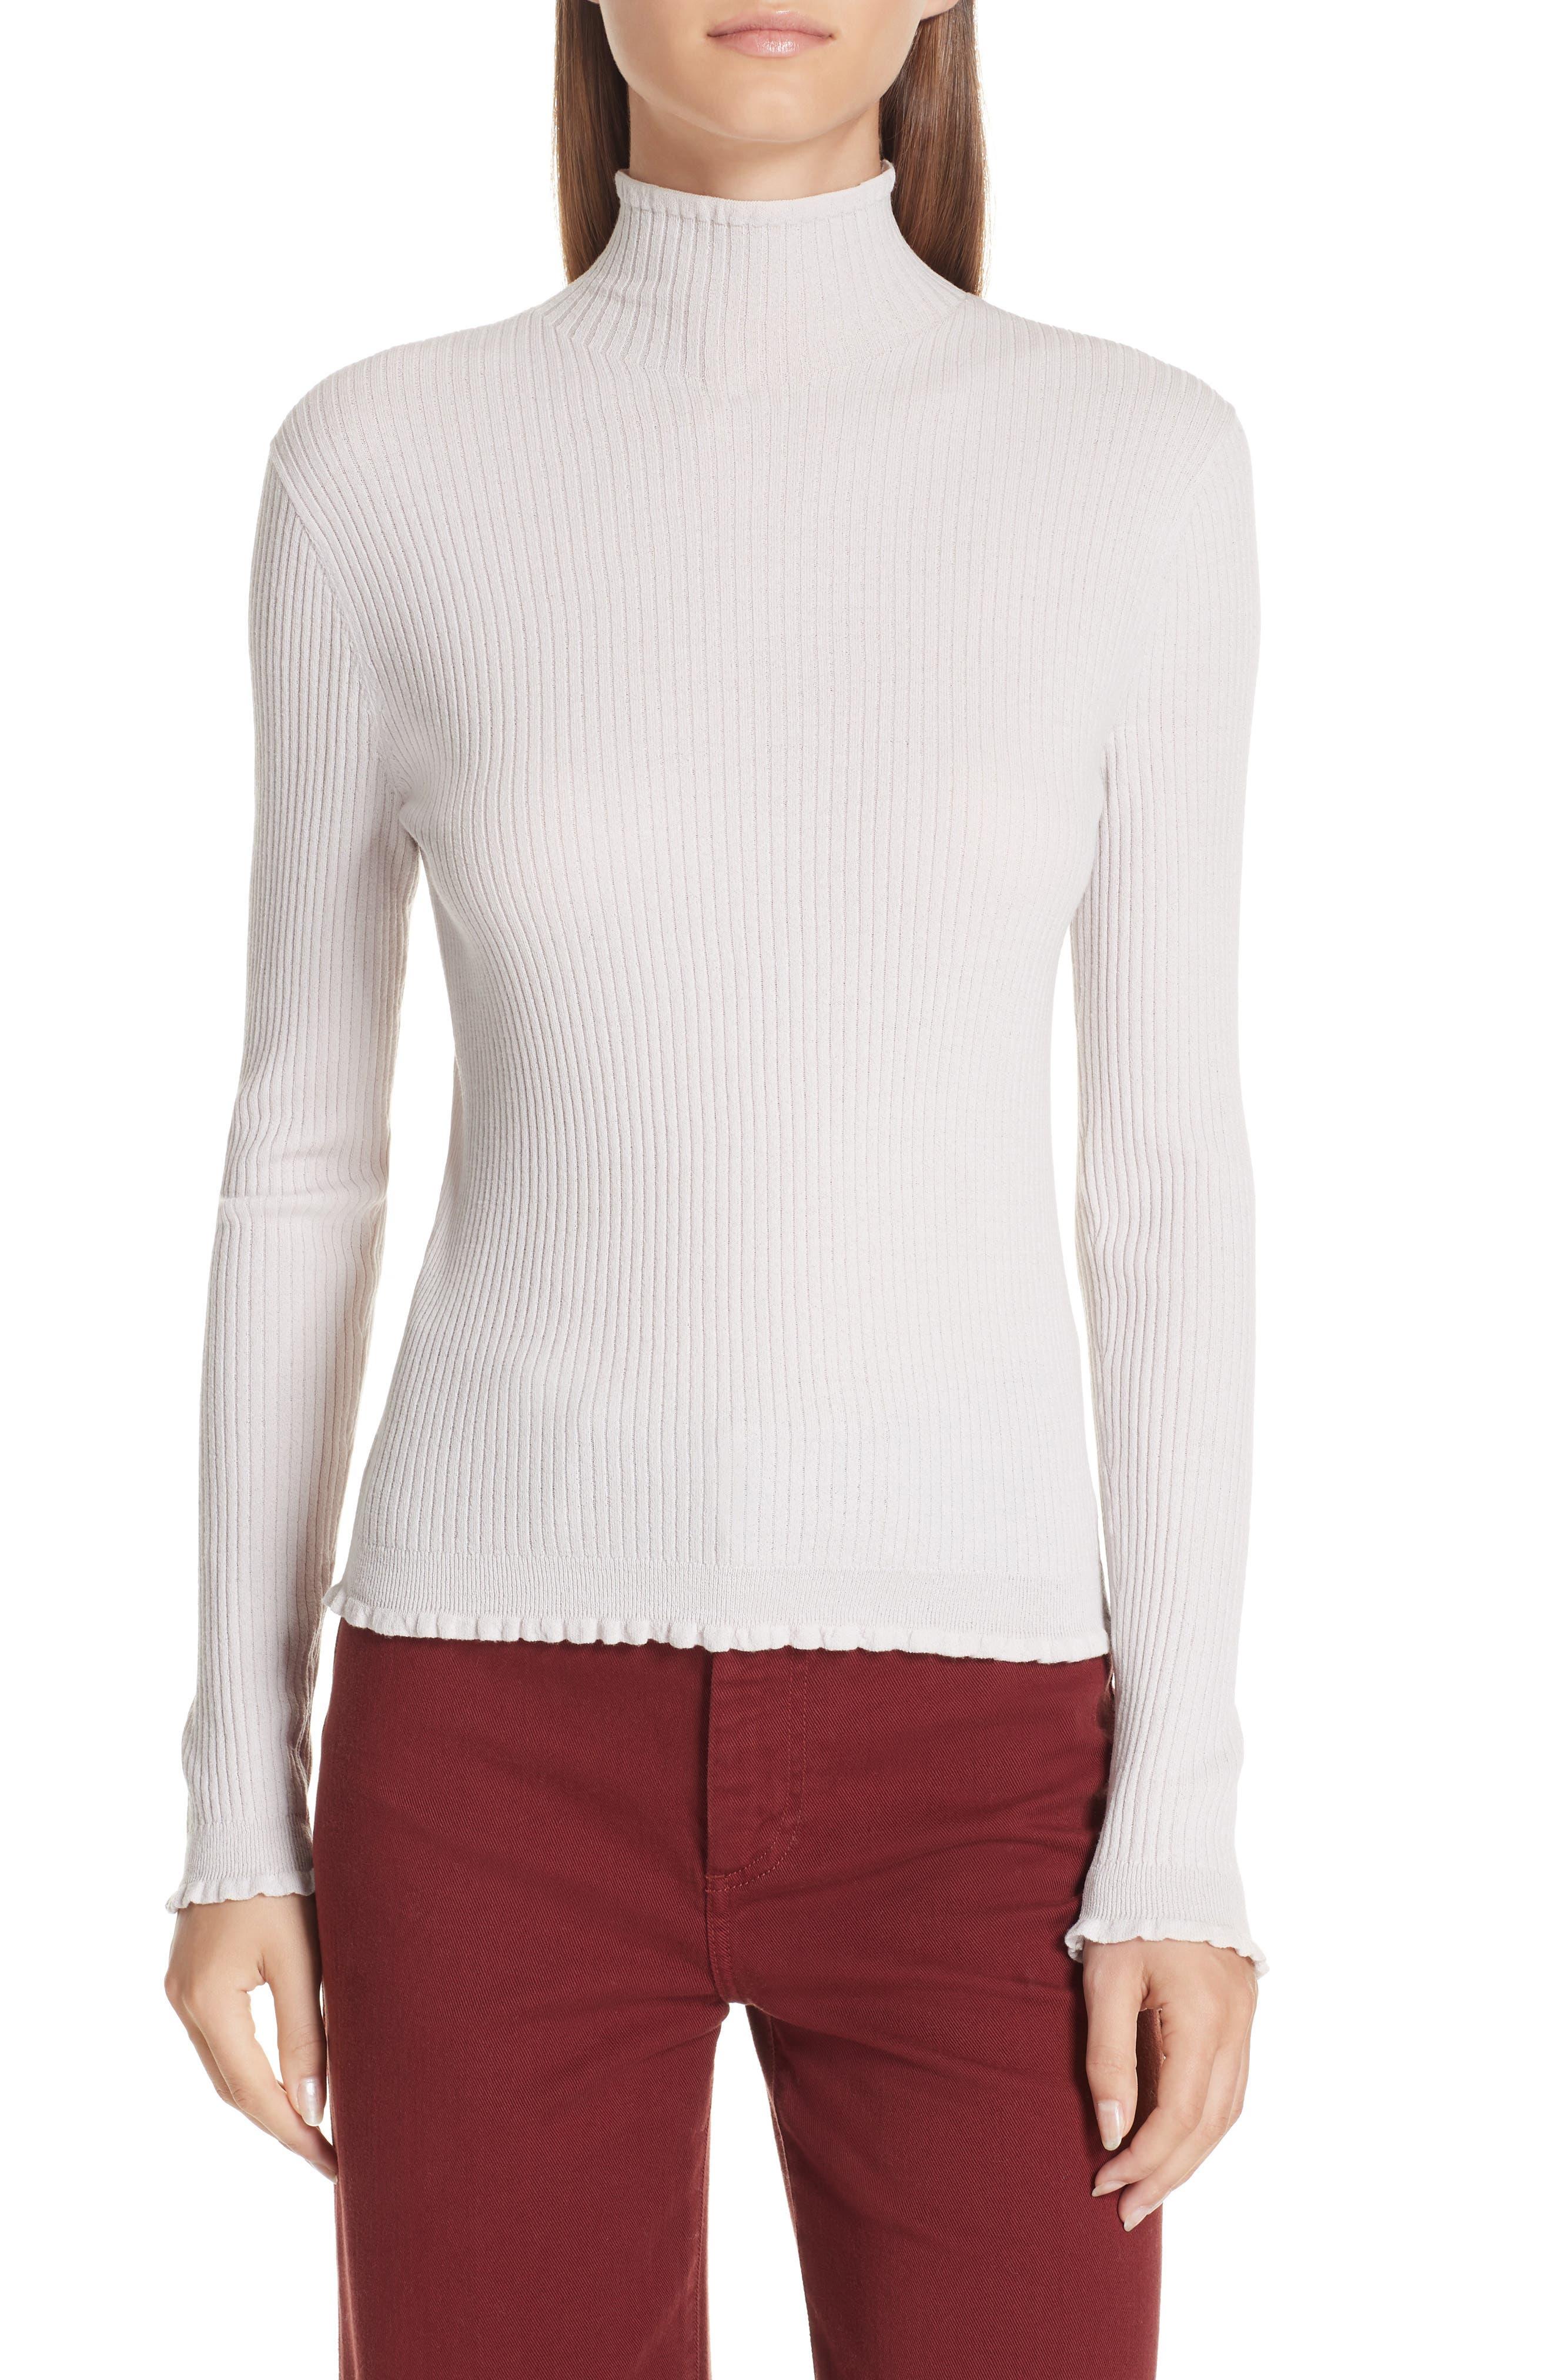 Vince Lettuce Edge Mock Neck Merino Wool Sweater